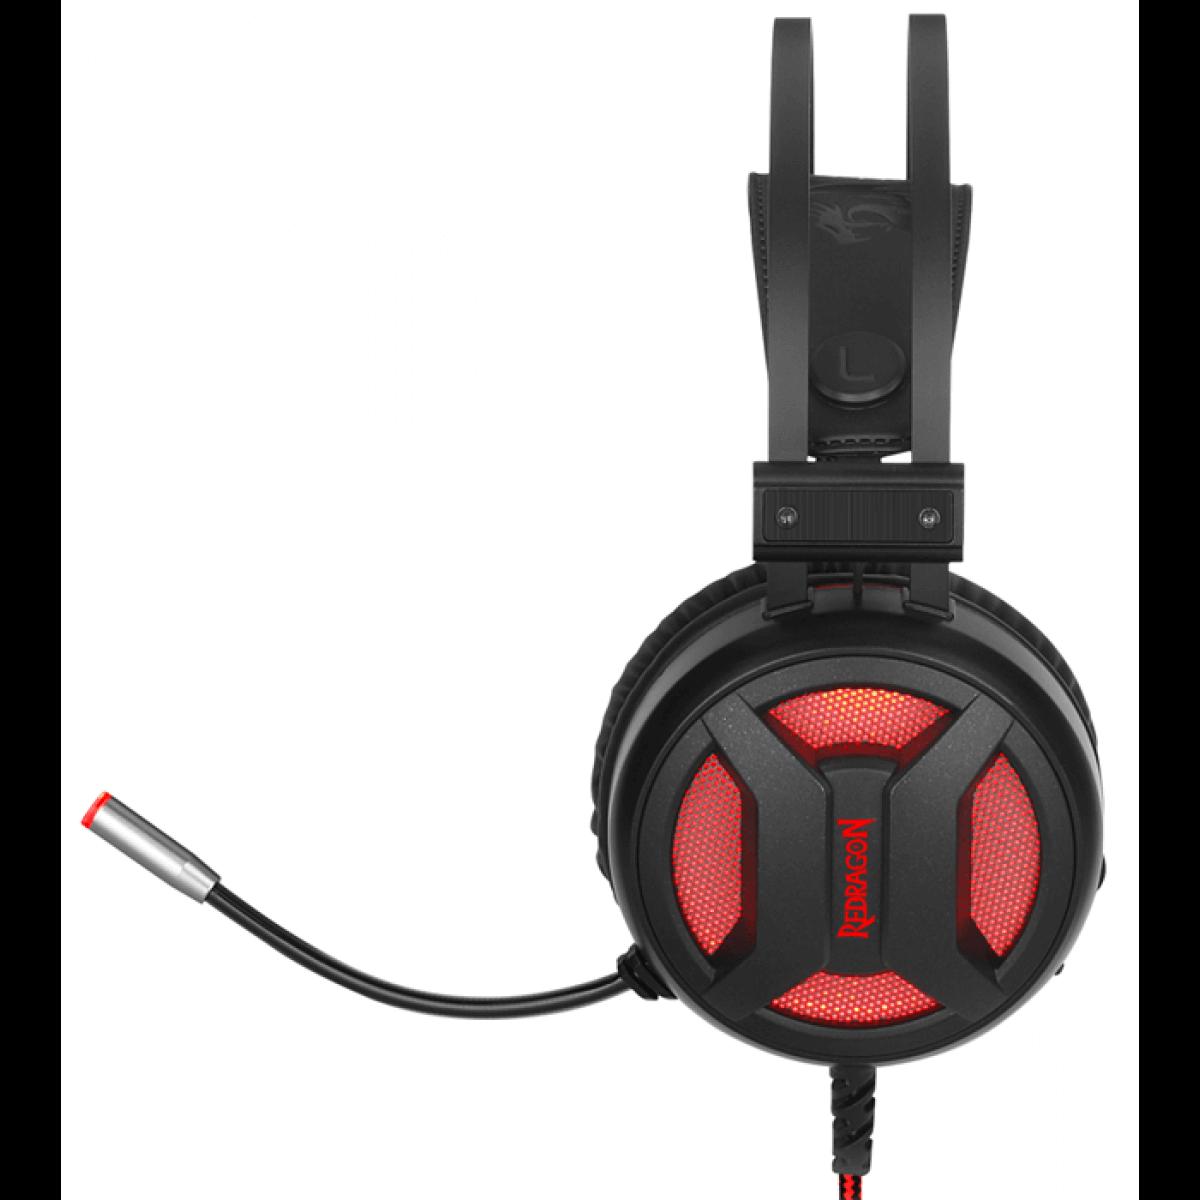 Headset Redragon USB Surround 7.1 Led Minos H210 Preto/Vermelho